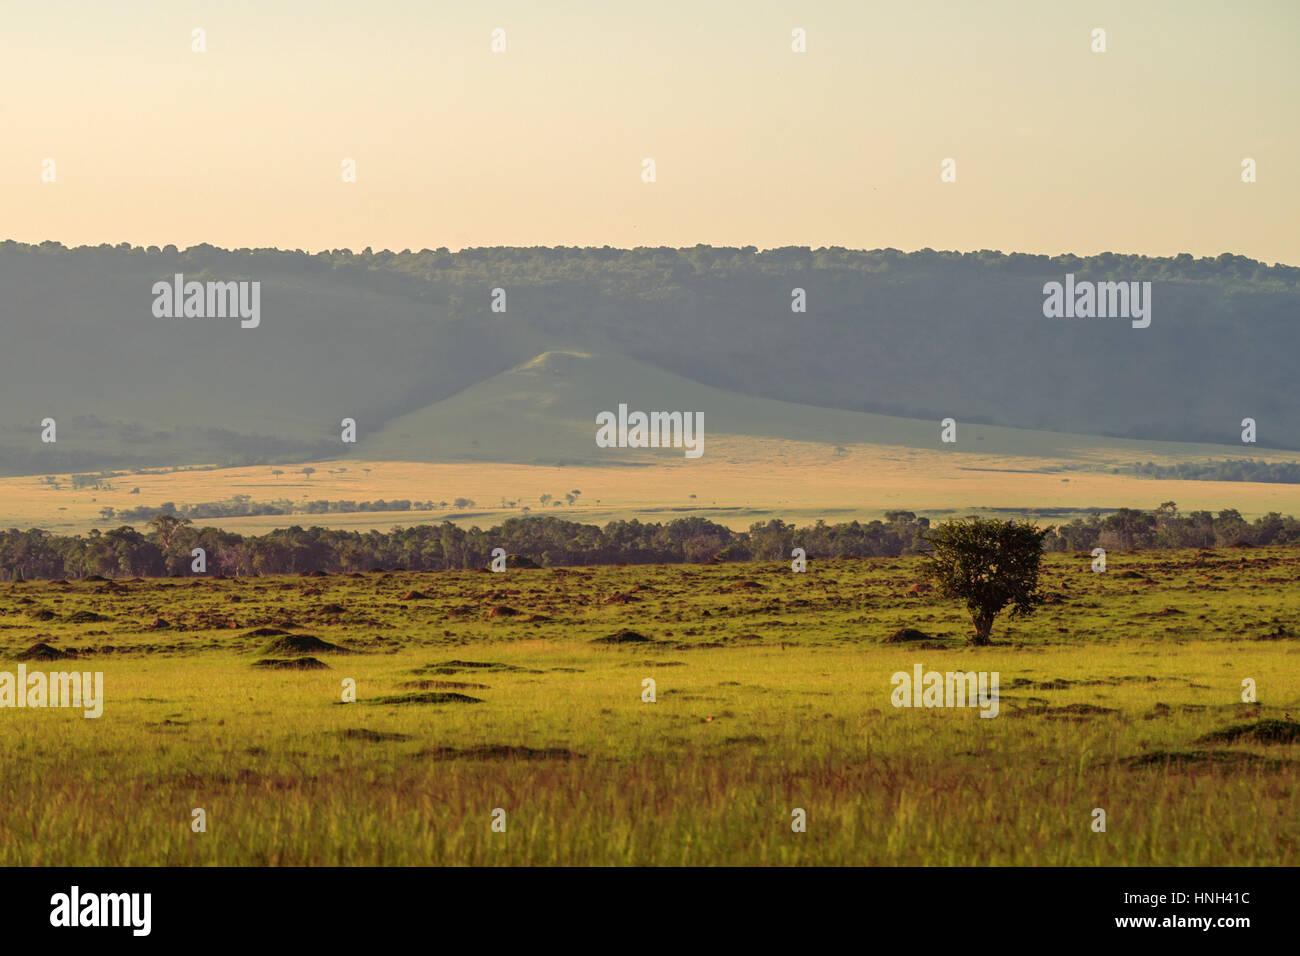 Paysage de savane africaine pittoresque dans le Masai Mara, Kenya Photo Stock